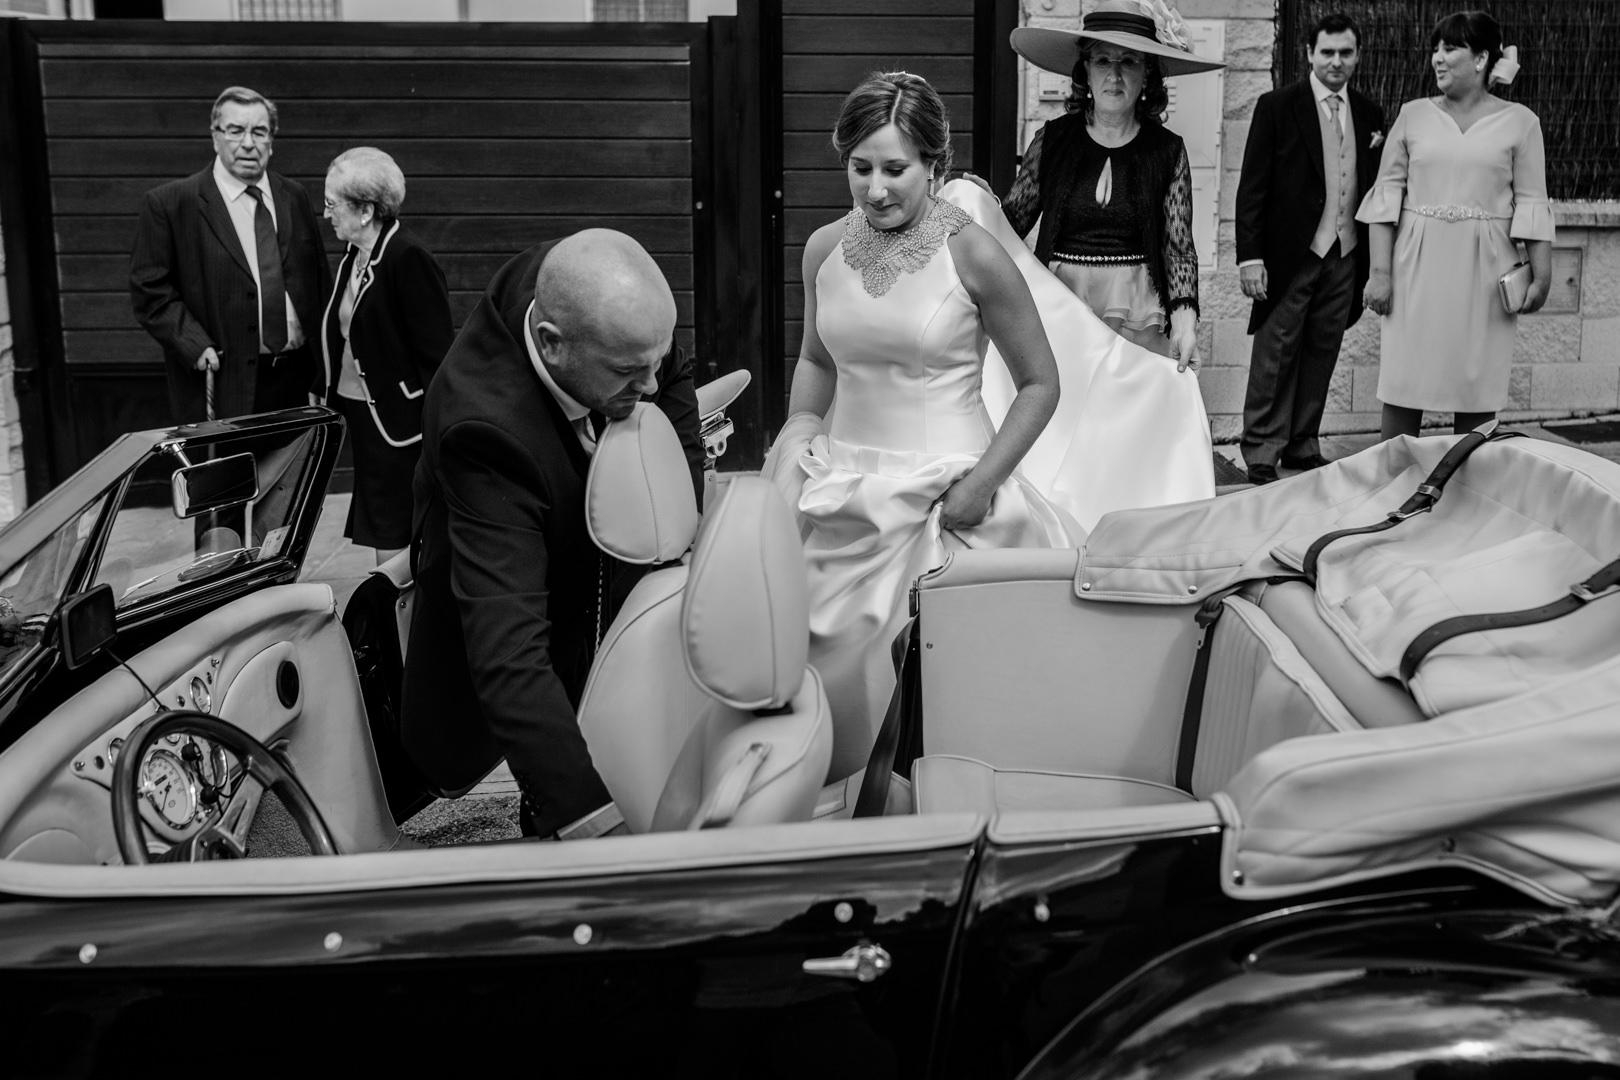 Boda-Catedral-Jaen-Hamburgo-Maria-David-engagement-Rafael-Torres-fotografo-bodas-sevilla-madrid-barcelona-wedding-photographer--17.jpg